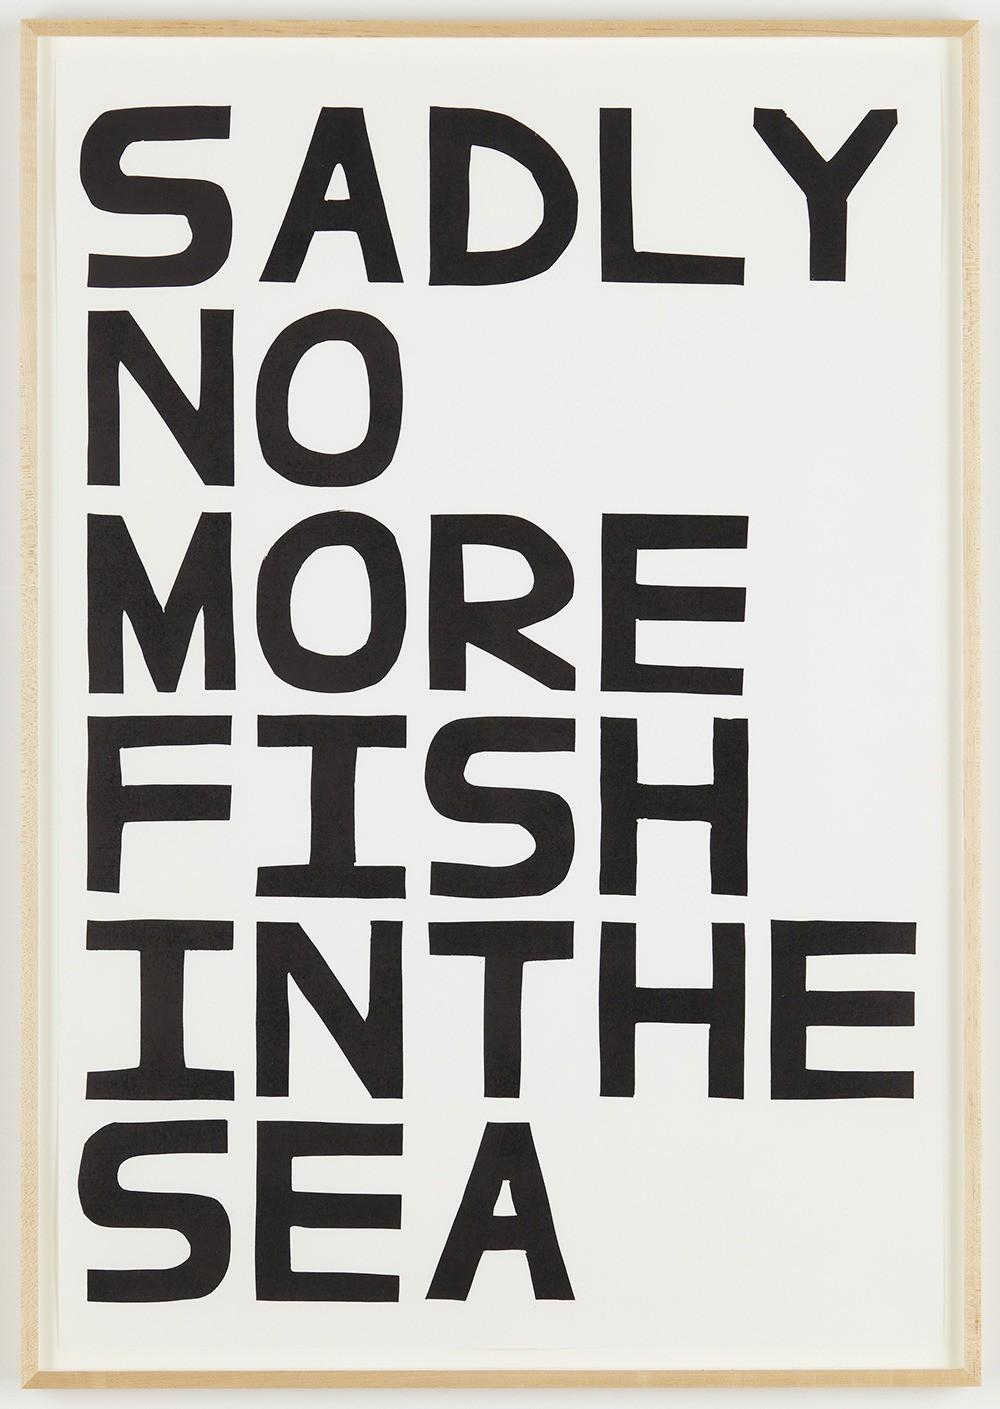 David Shrigley, Sadly No More Fish in the Sea, 2012, Unique linocut print, 41 3/8 x 28 3/8 inches, Courtesy Anton Kern Gallery, New York